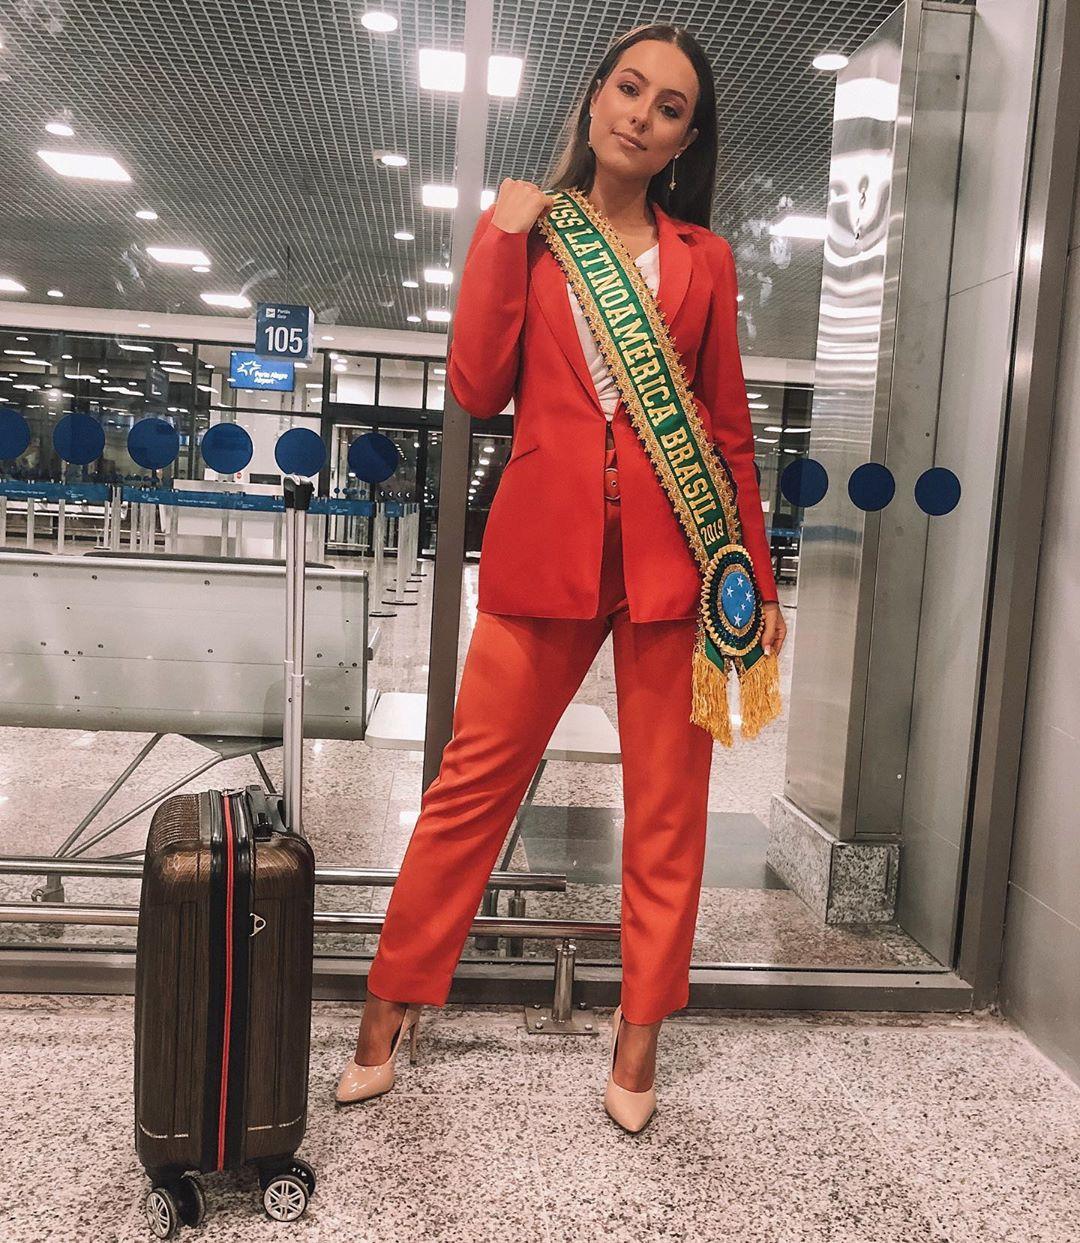 cristine boff sartor, segunda finalista de miss latinoamerica 2019. - Página 7 67562410